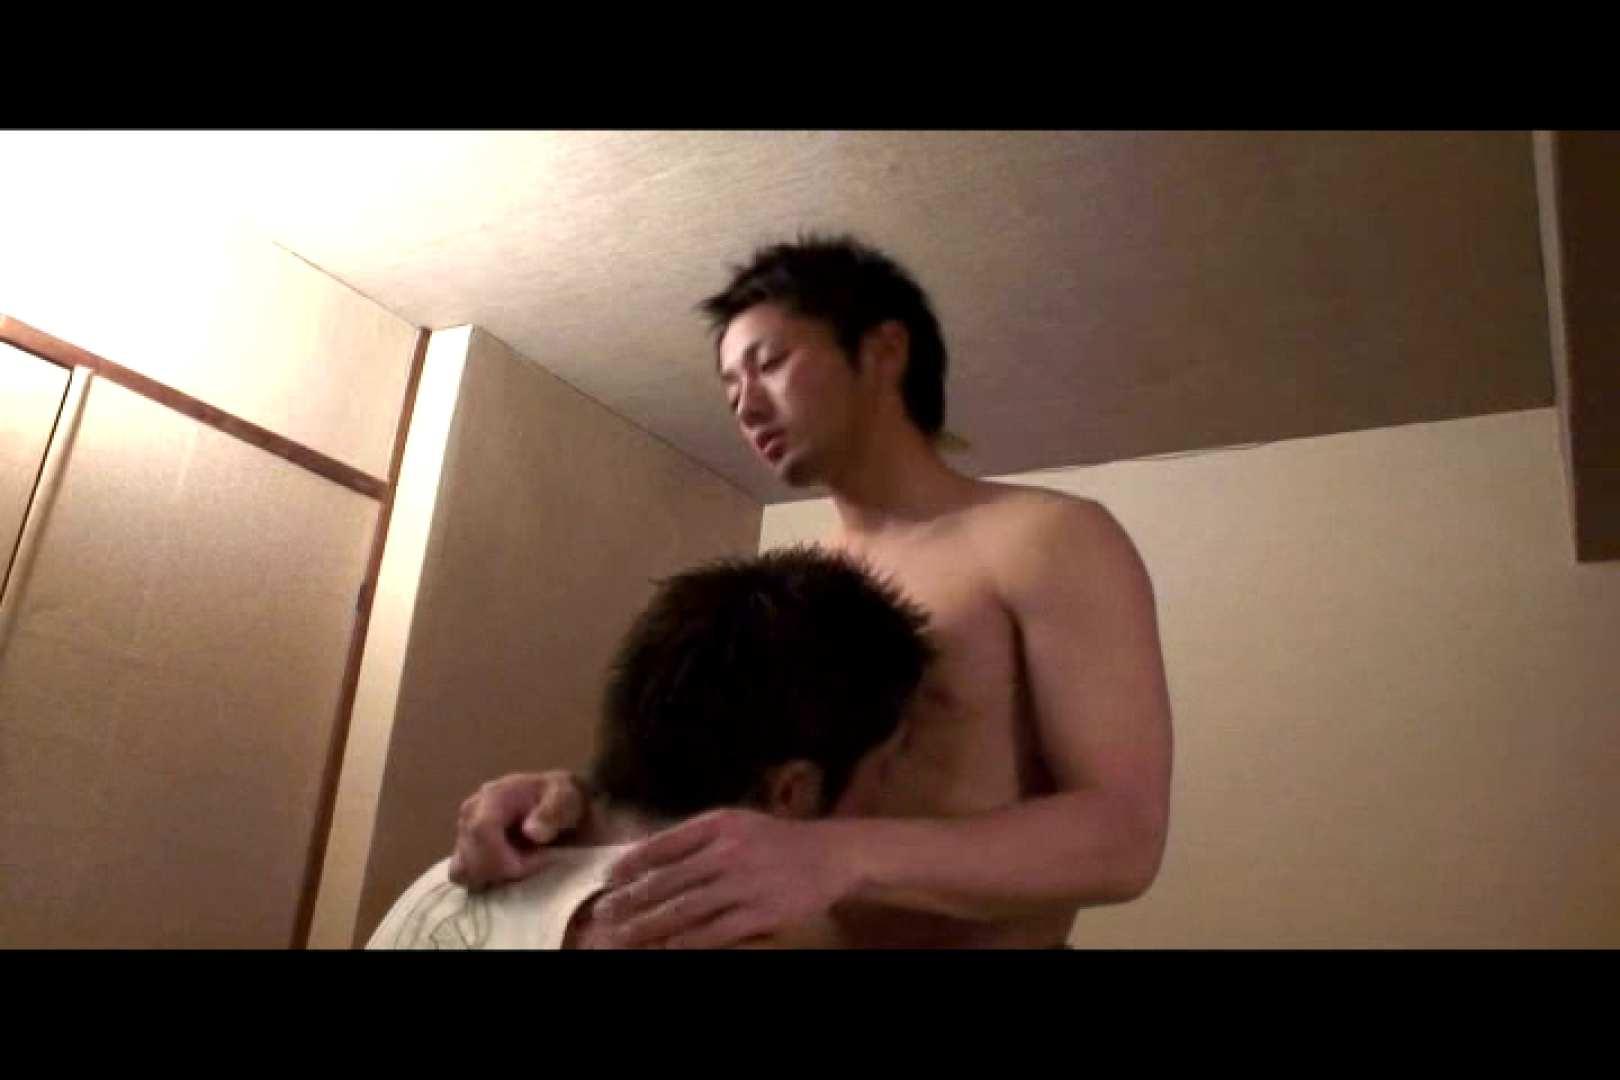 Bistro「イケメン」~Mokkori和風仕立て~vol.01 手コキ ゲイエロ画像 111pic 83